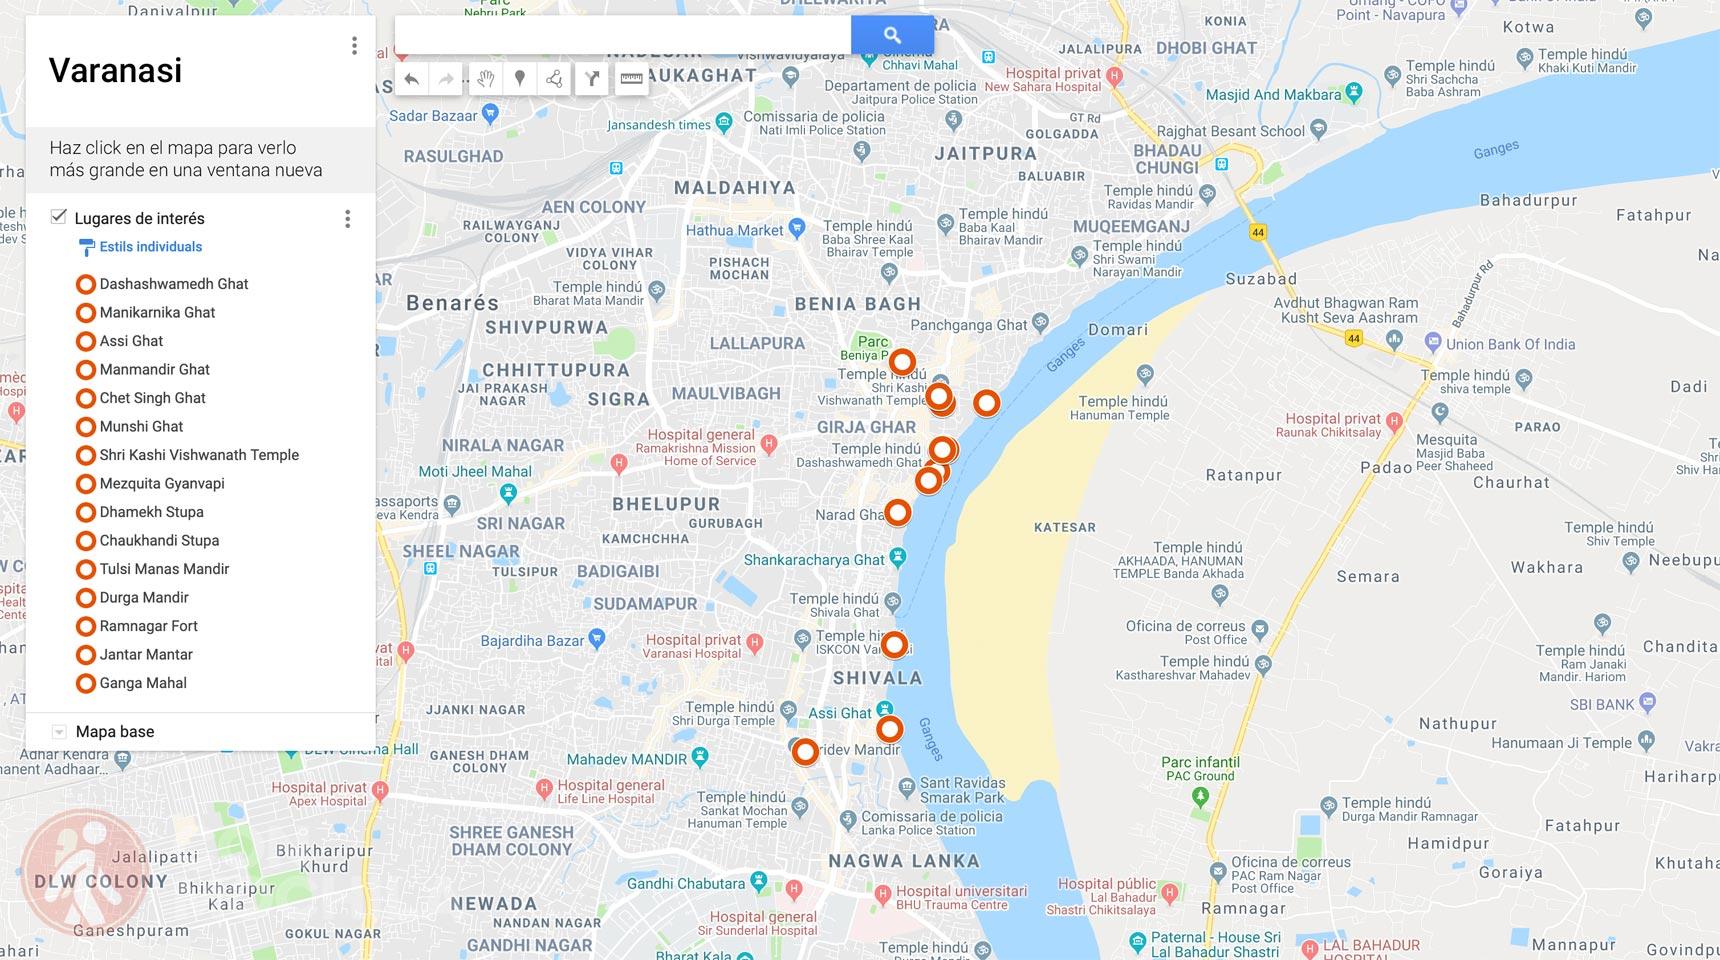 Mapa Varanasi